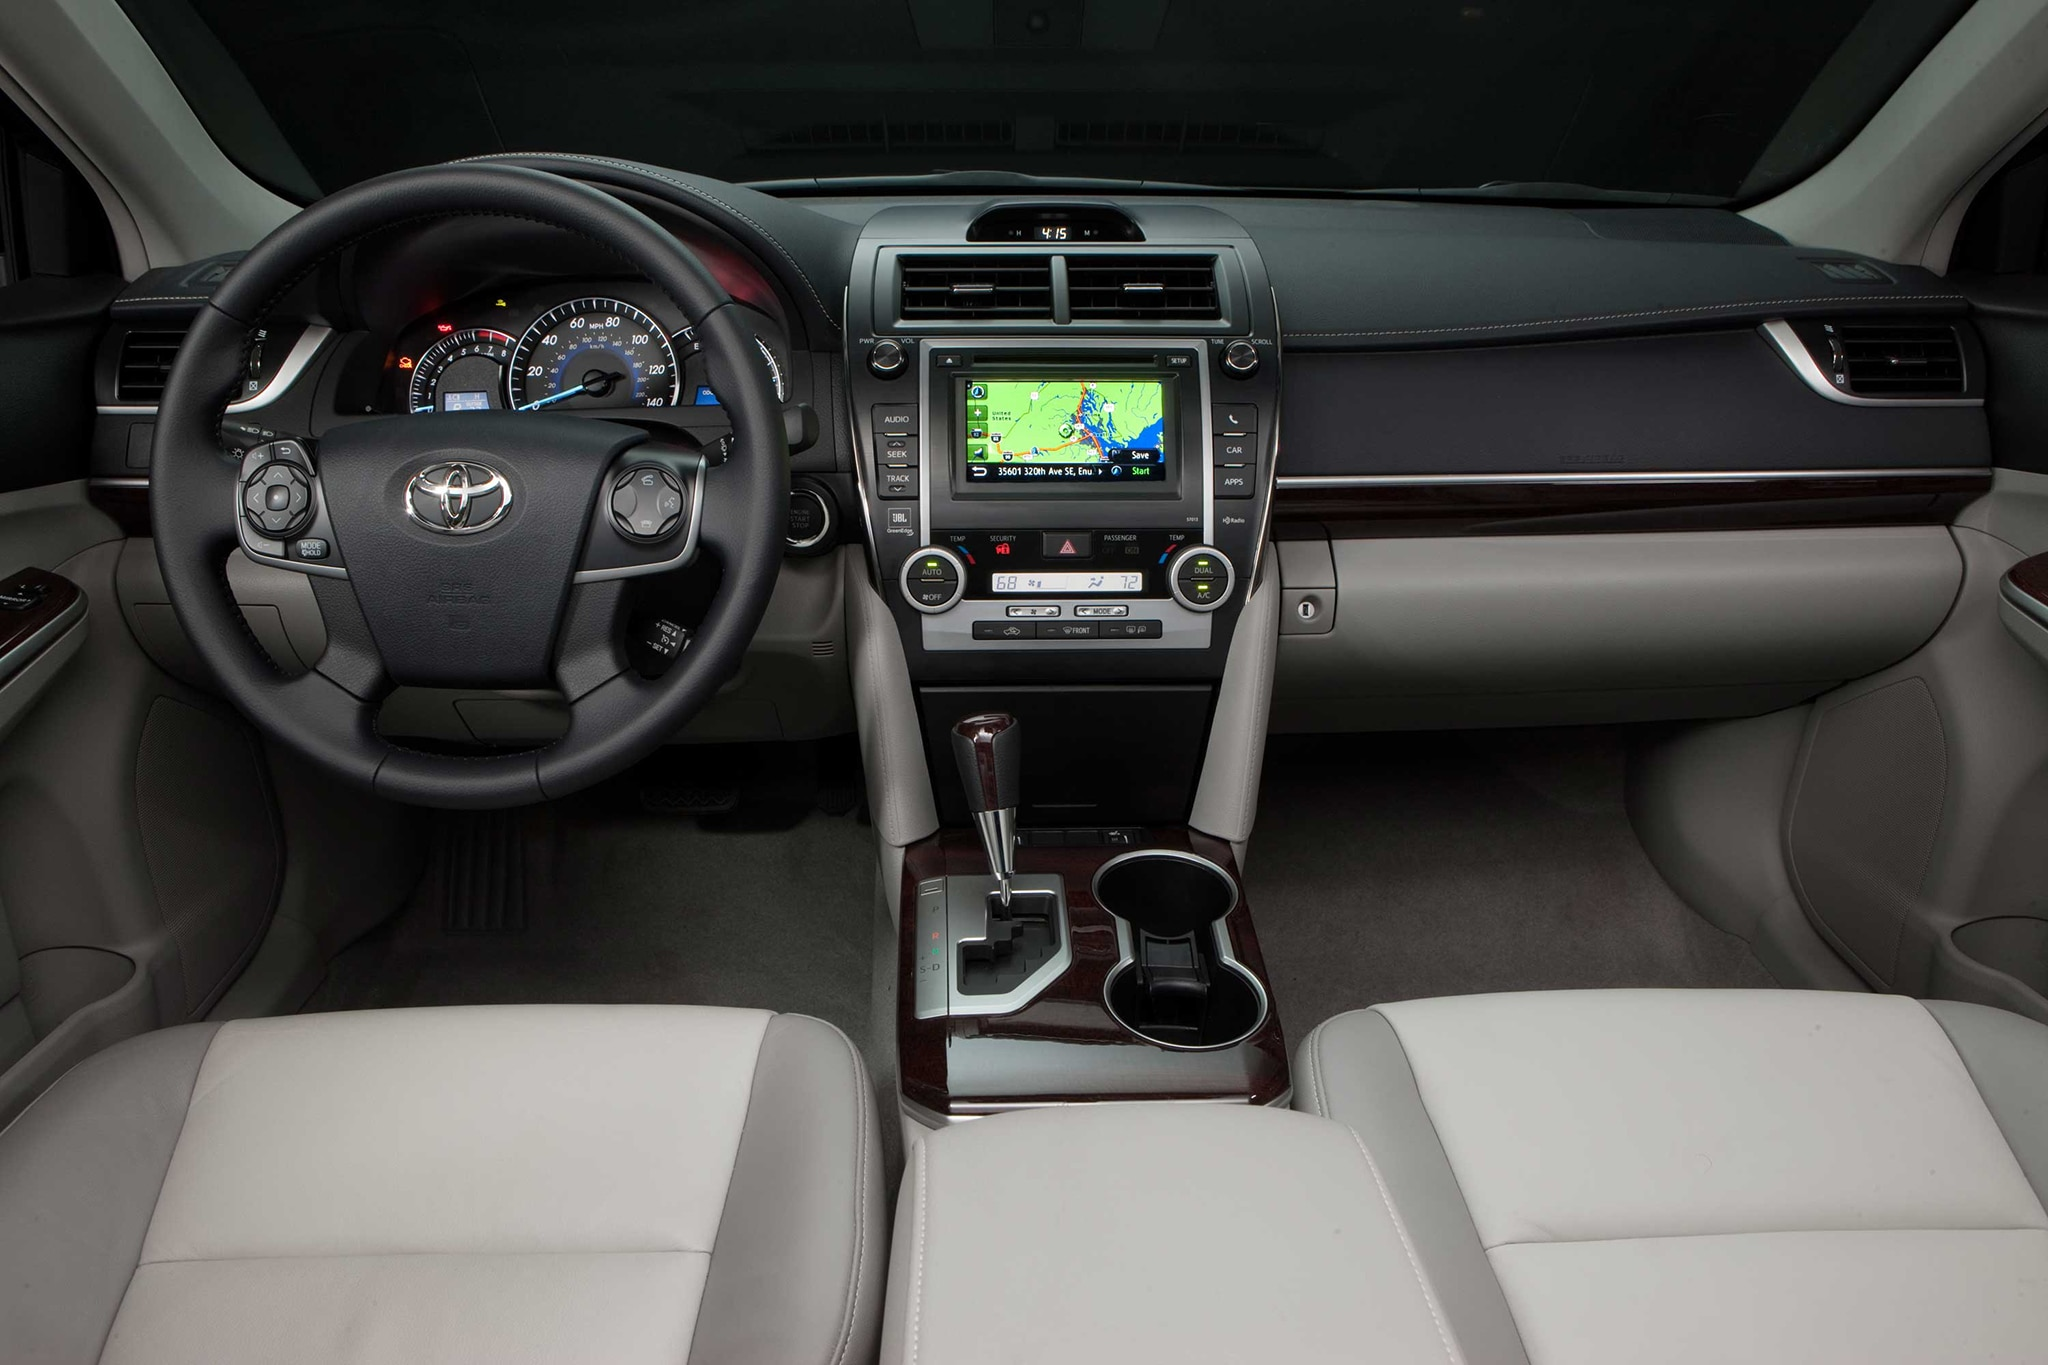 2013-Toyota-Camry-XLE-dash Extraordinary toyota Camry 2006 Vs Honda Accord 2006 Cars Trend